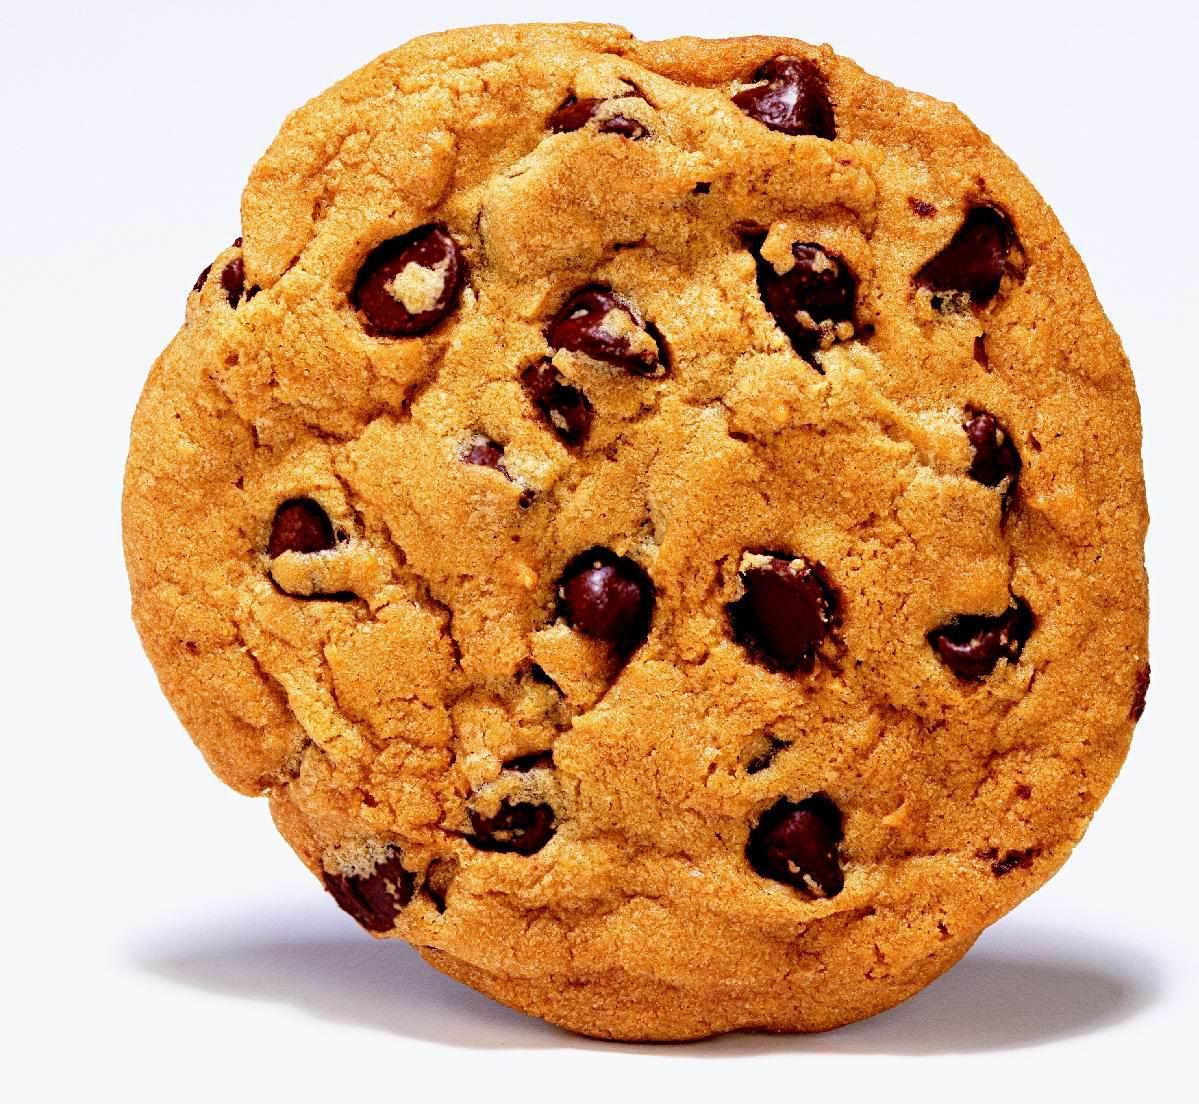 Chocolate Cookie appreciation